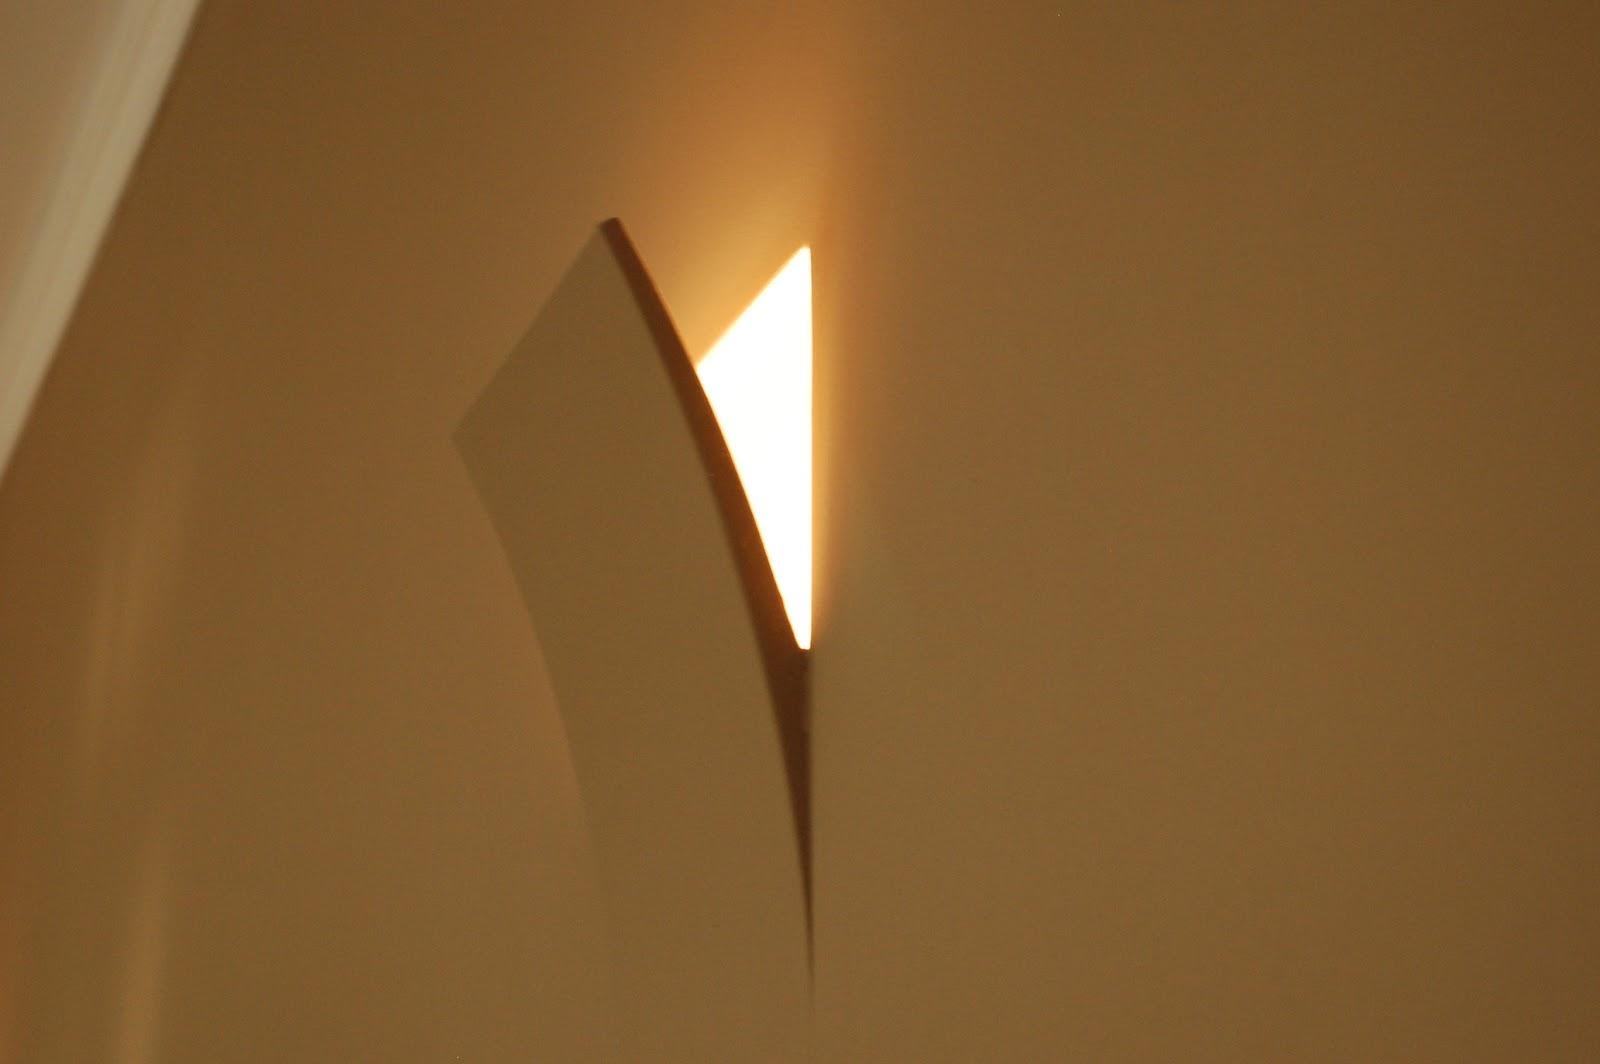 Forum Arredamento.it •Illuminazione parete Pietra: quale applique